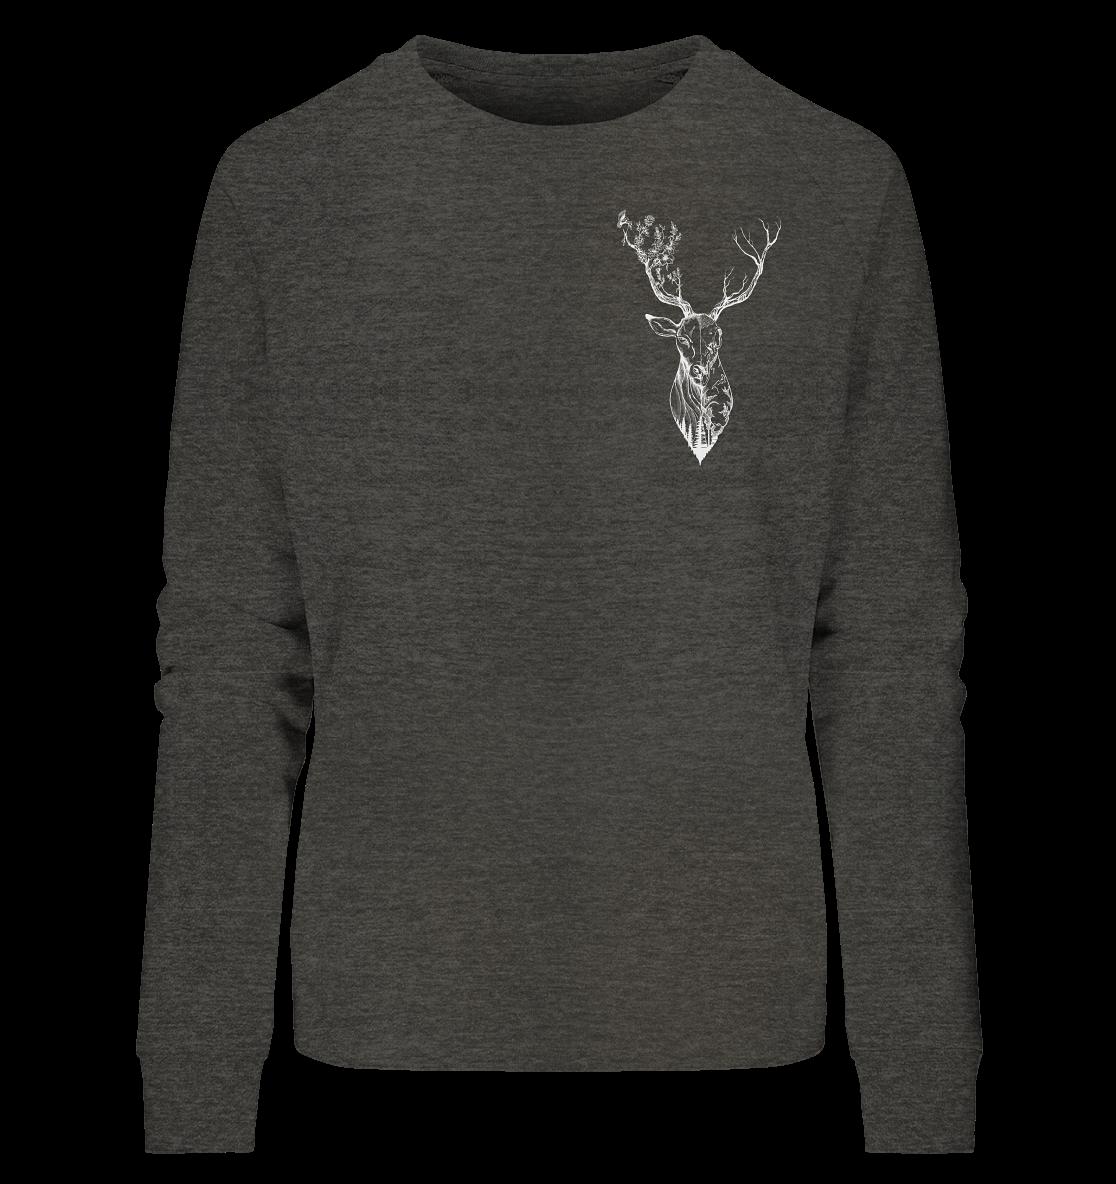 front-ladies-organic-sweatshirt-252625-1116x-6.png